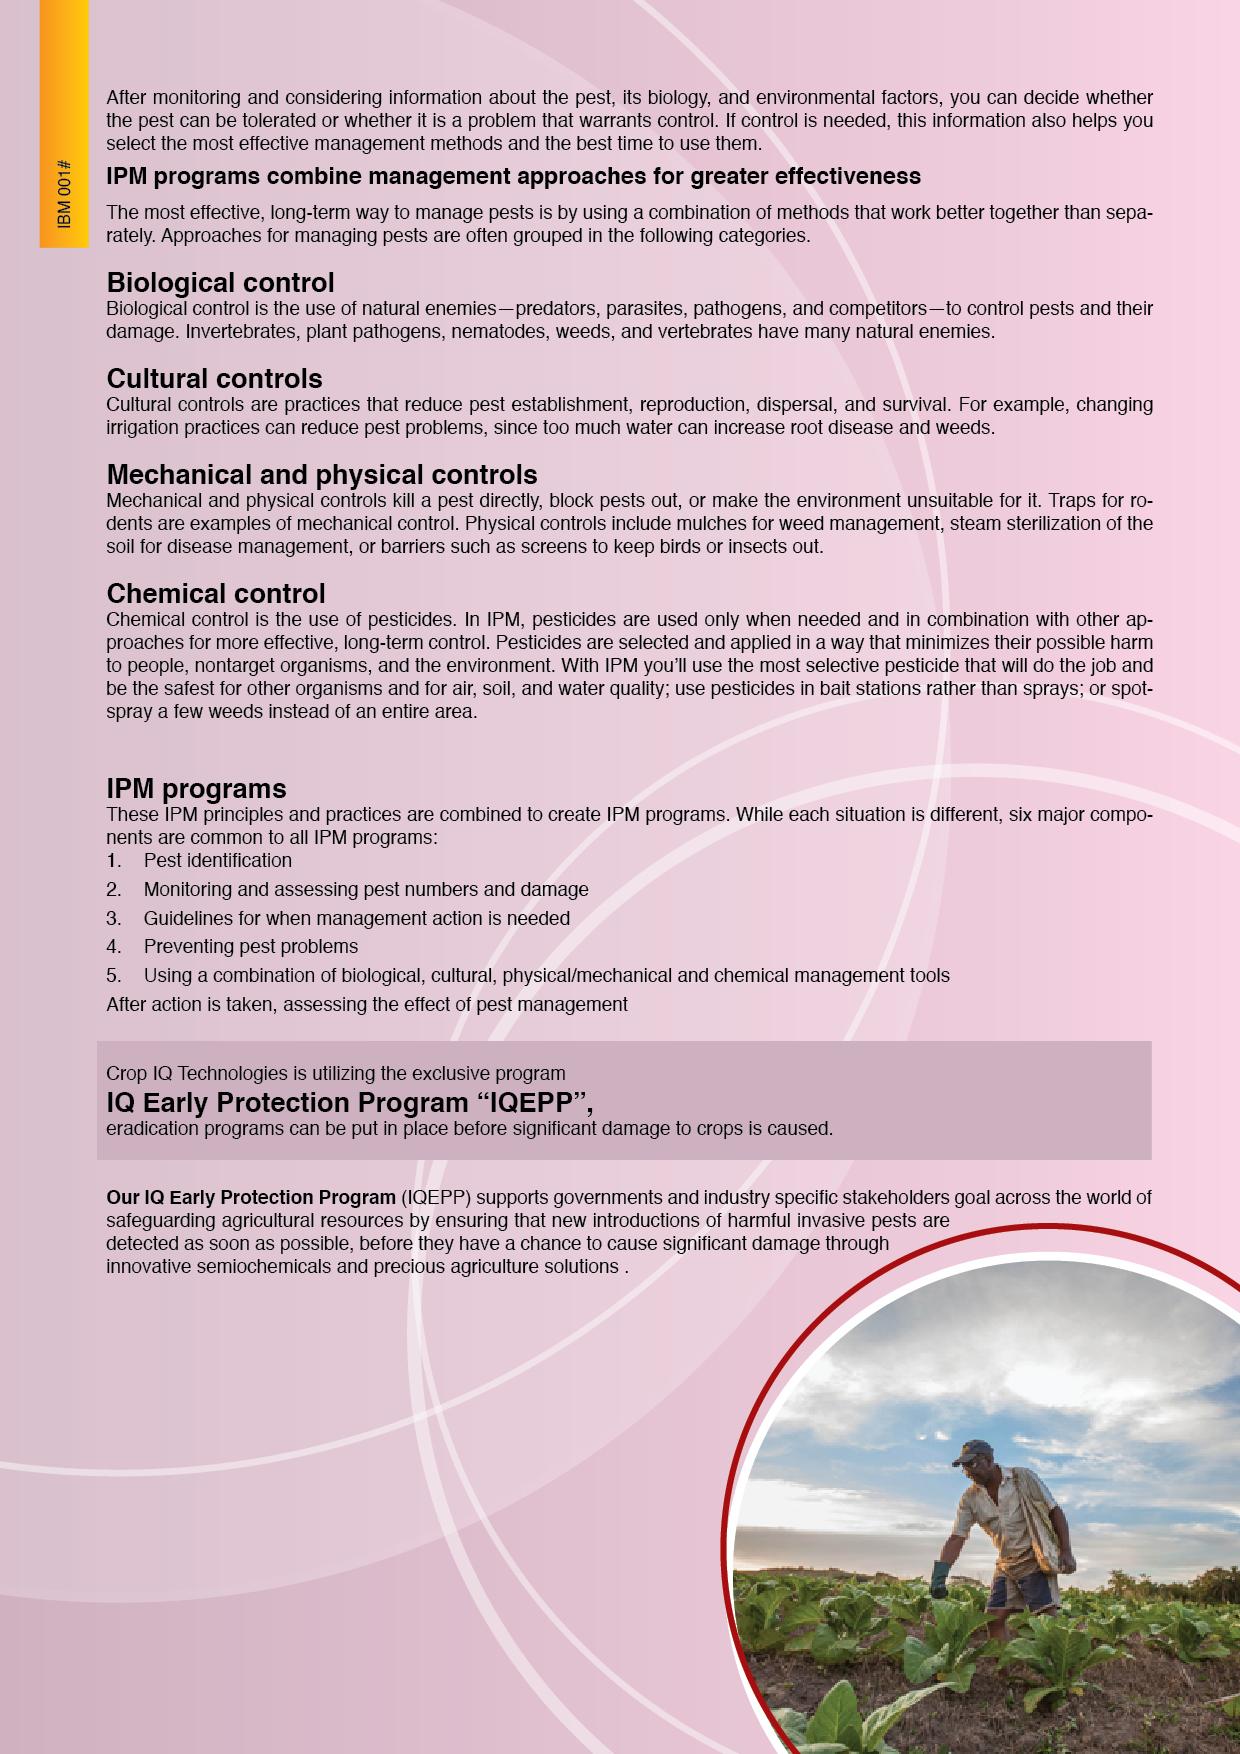 definition ipm i integrated pest management i crop iq technology